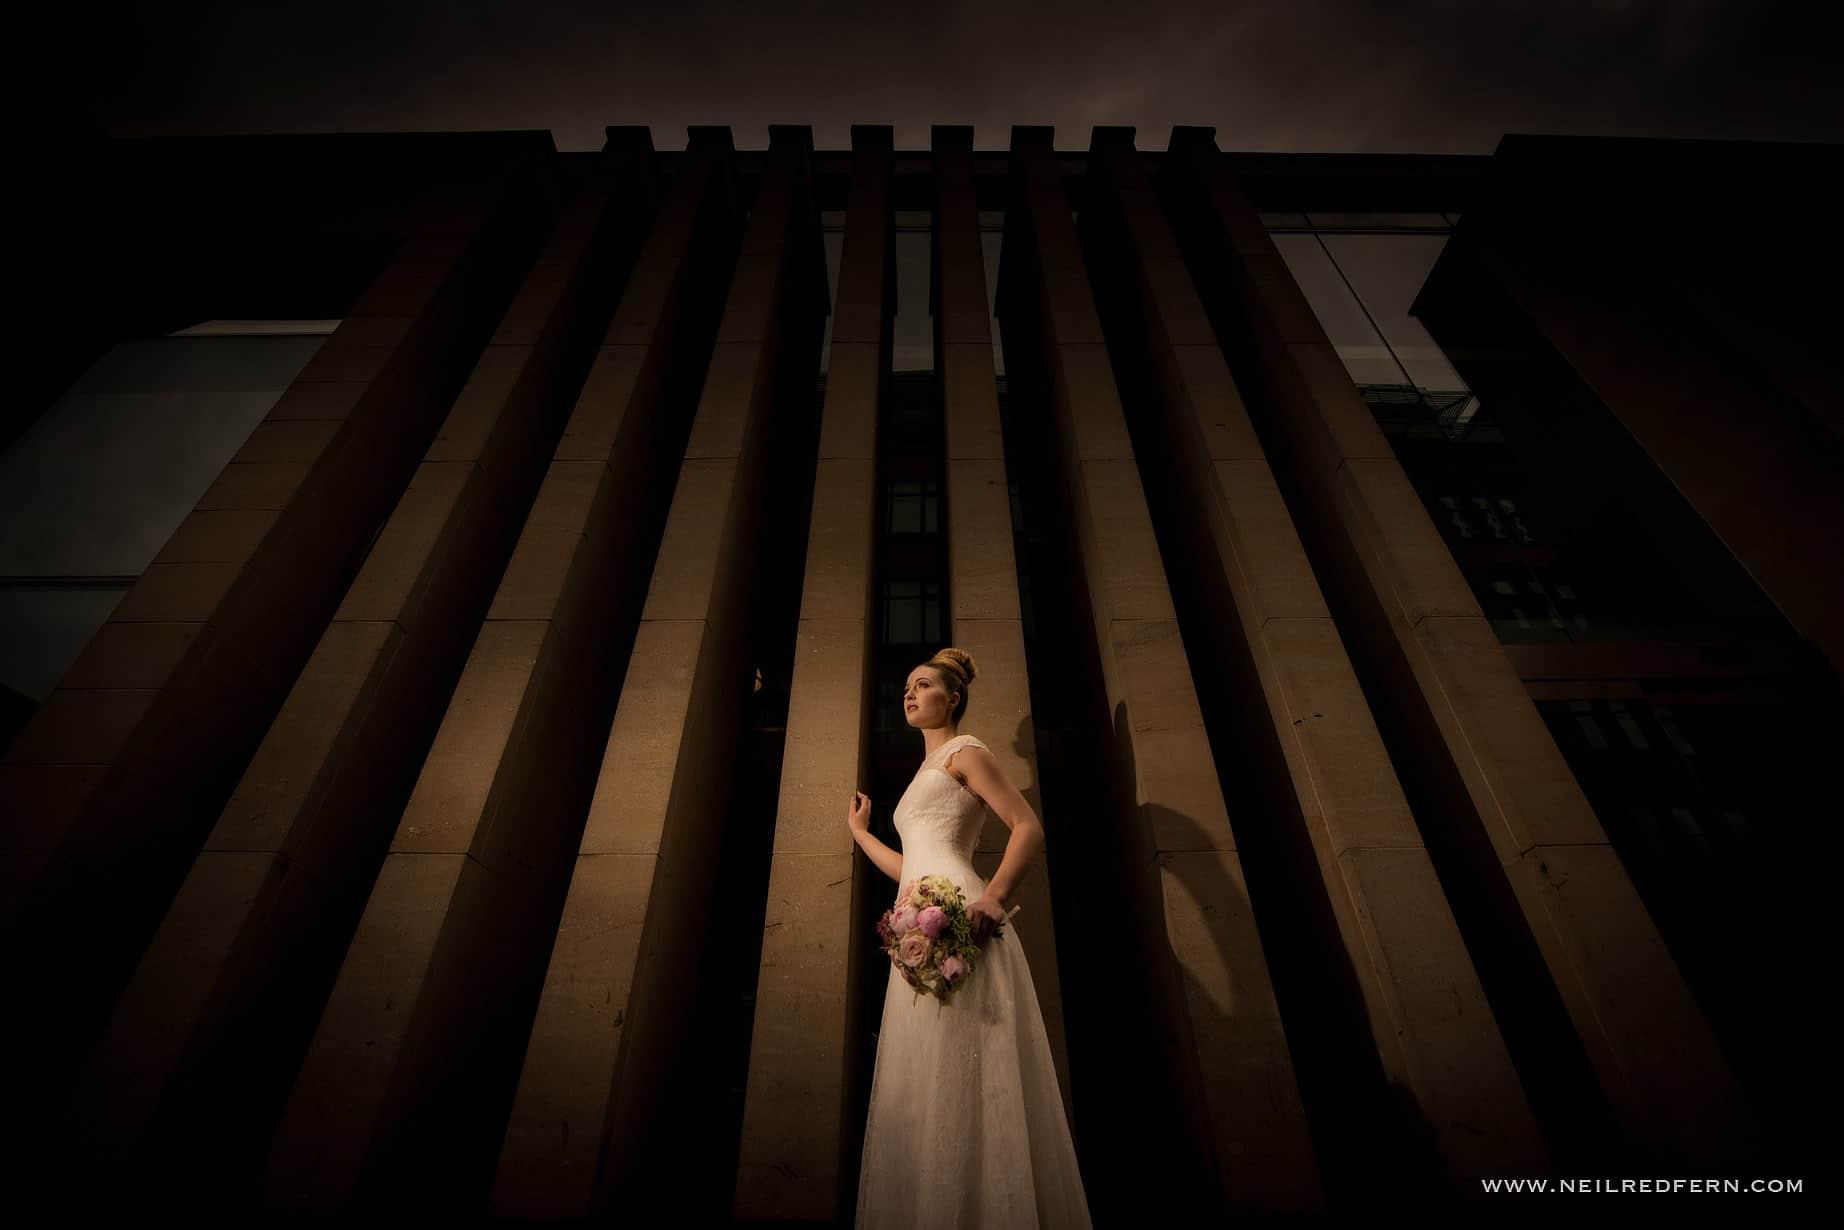 Redfern Crawley Wedding Photography Workshops – Part 4